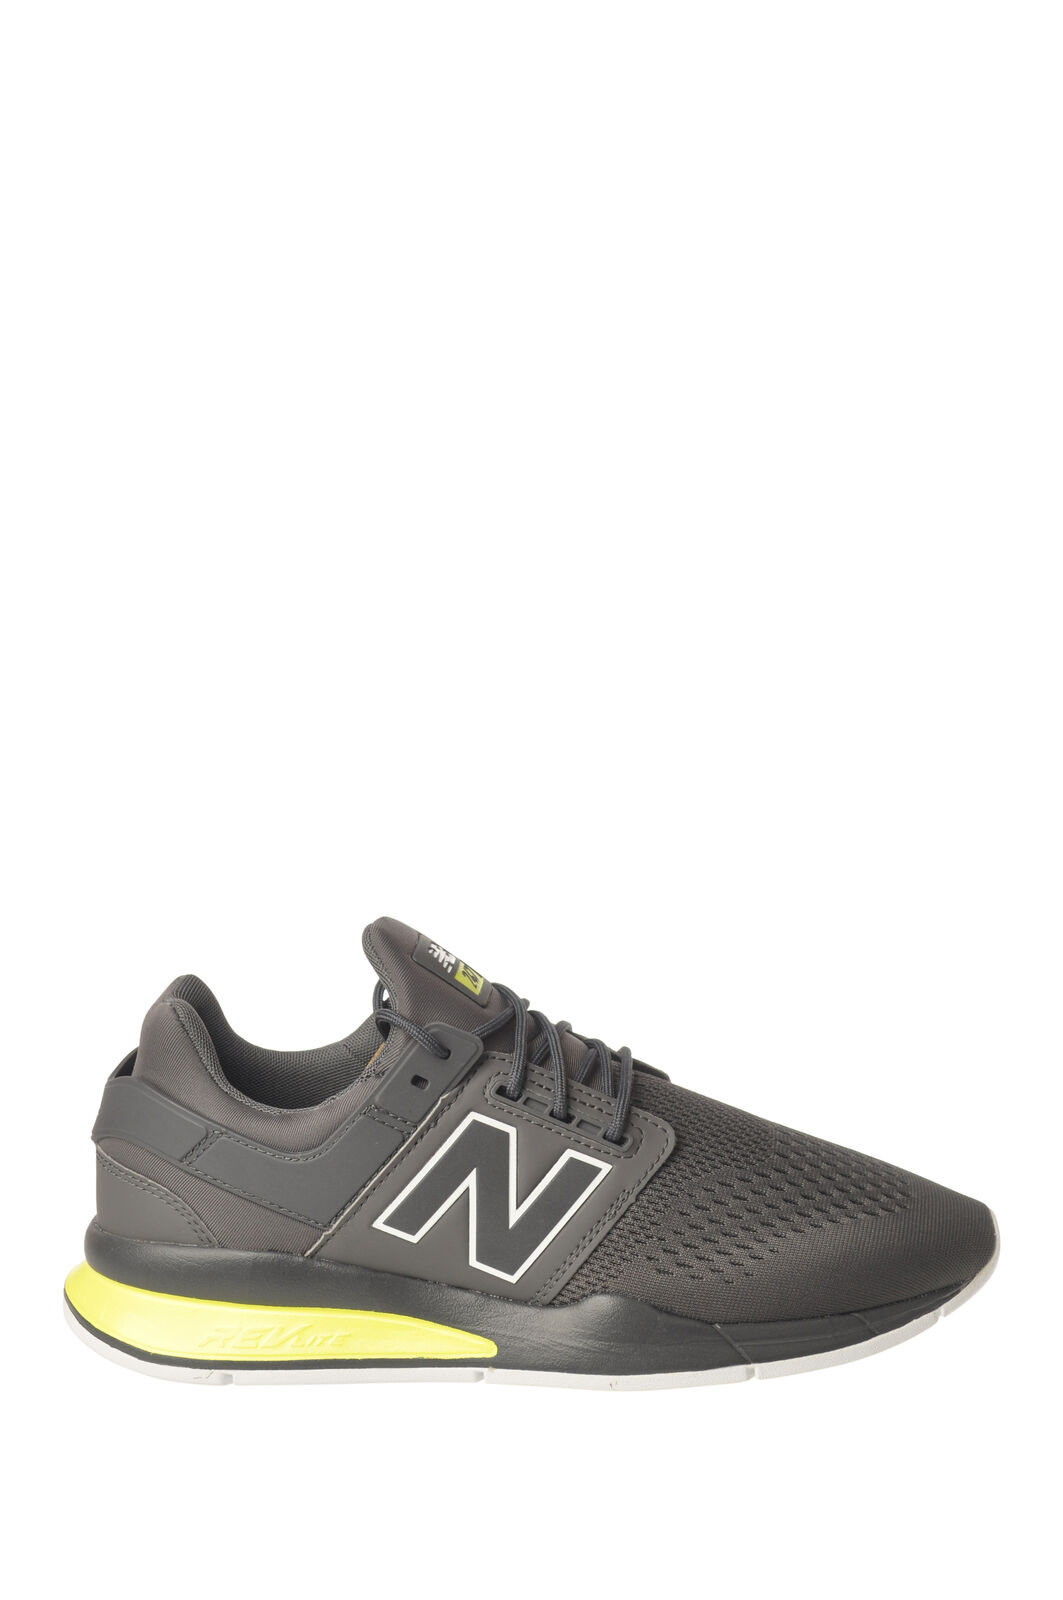 New Balance - zapatos-Lace Up - Man - gris - 5773801F190840